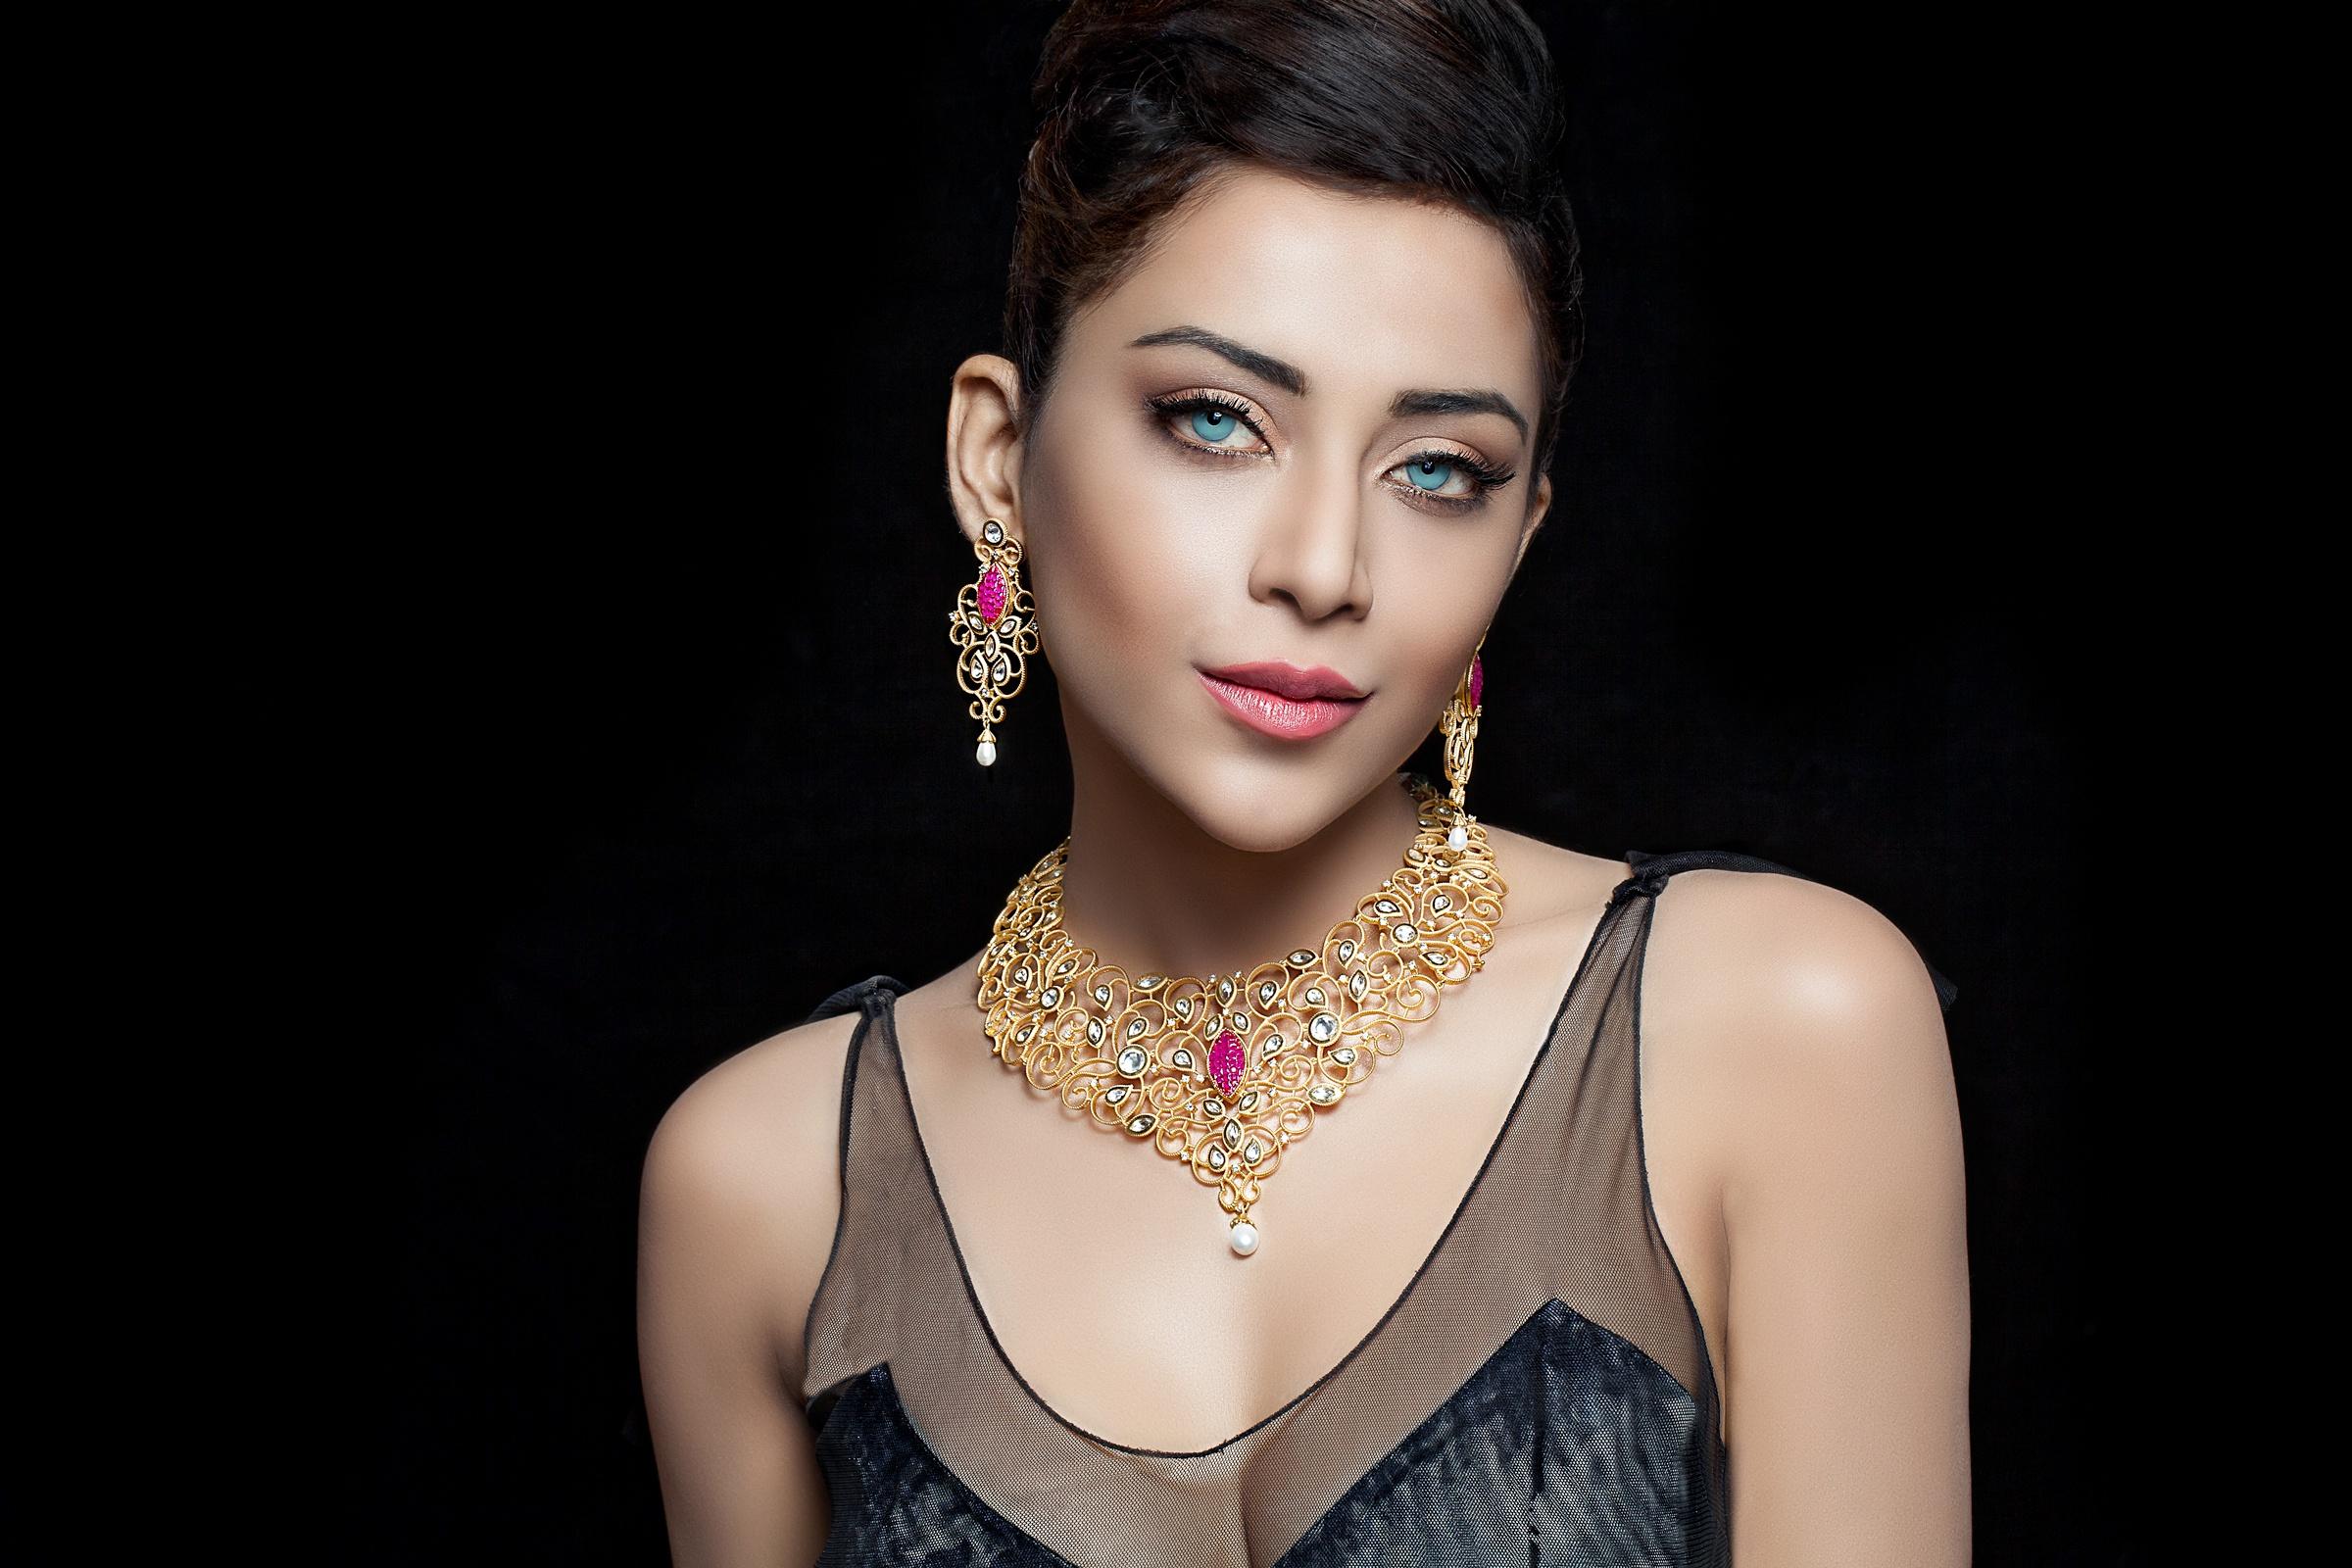 jewellery-by-sexy-girls-nude-women-slive